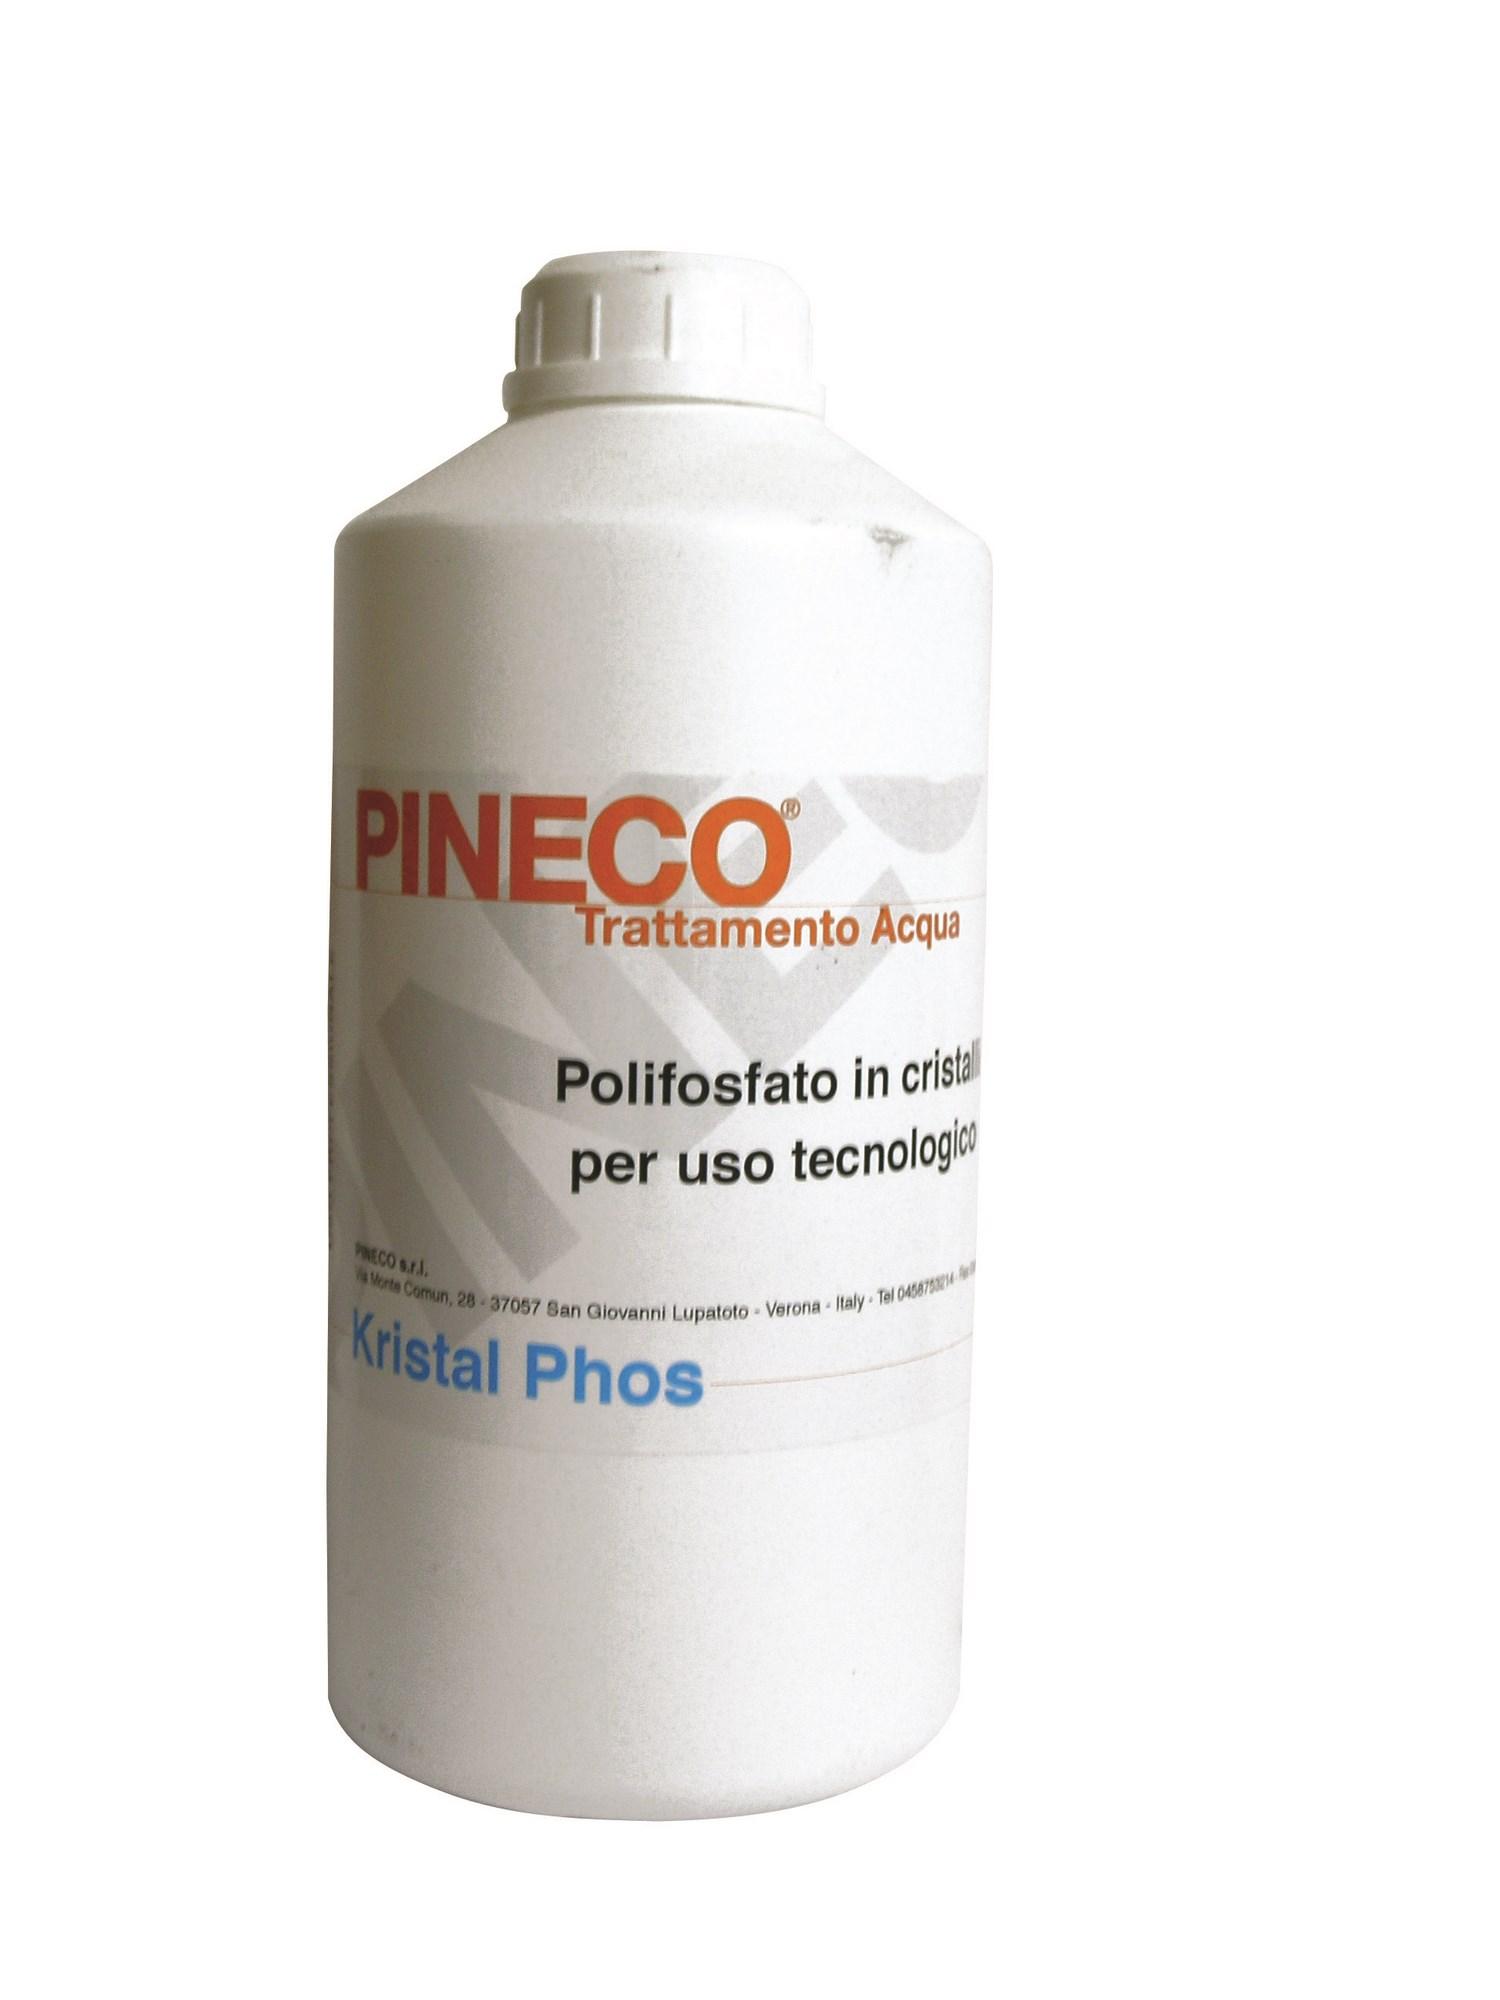 kristal phos pineco